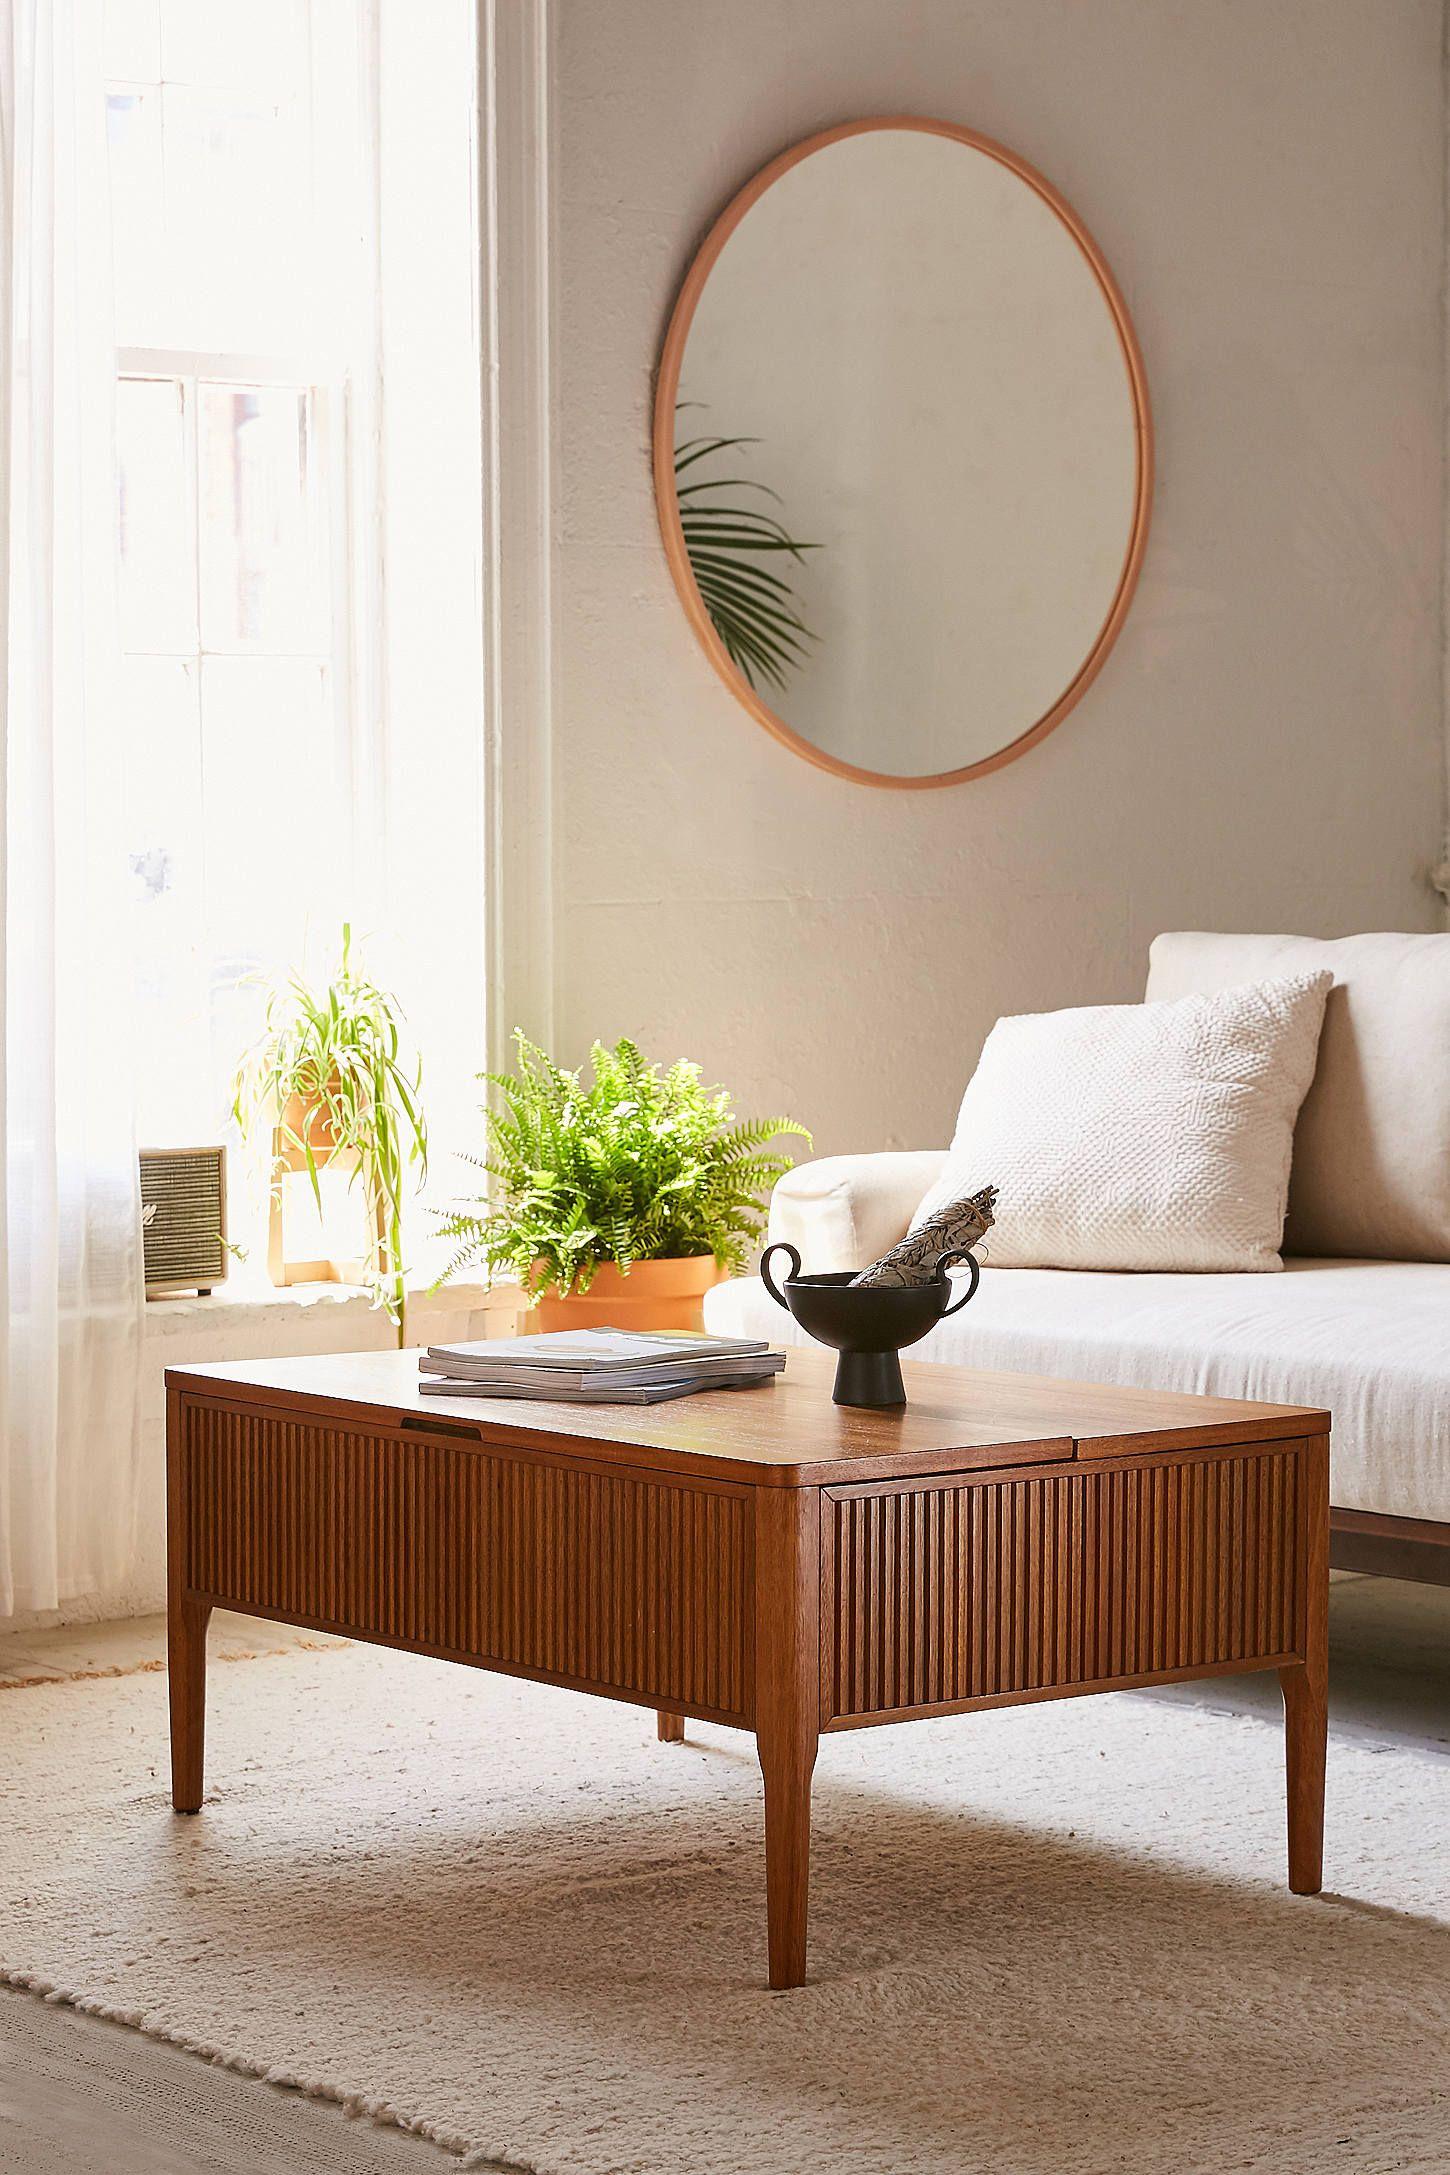 naya pop up coffee table furnishings pinterest living room rh pinterest com